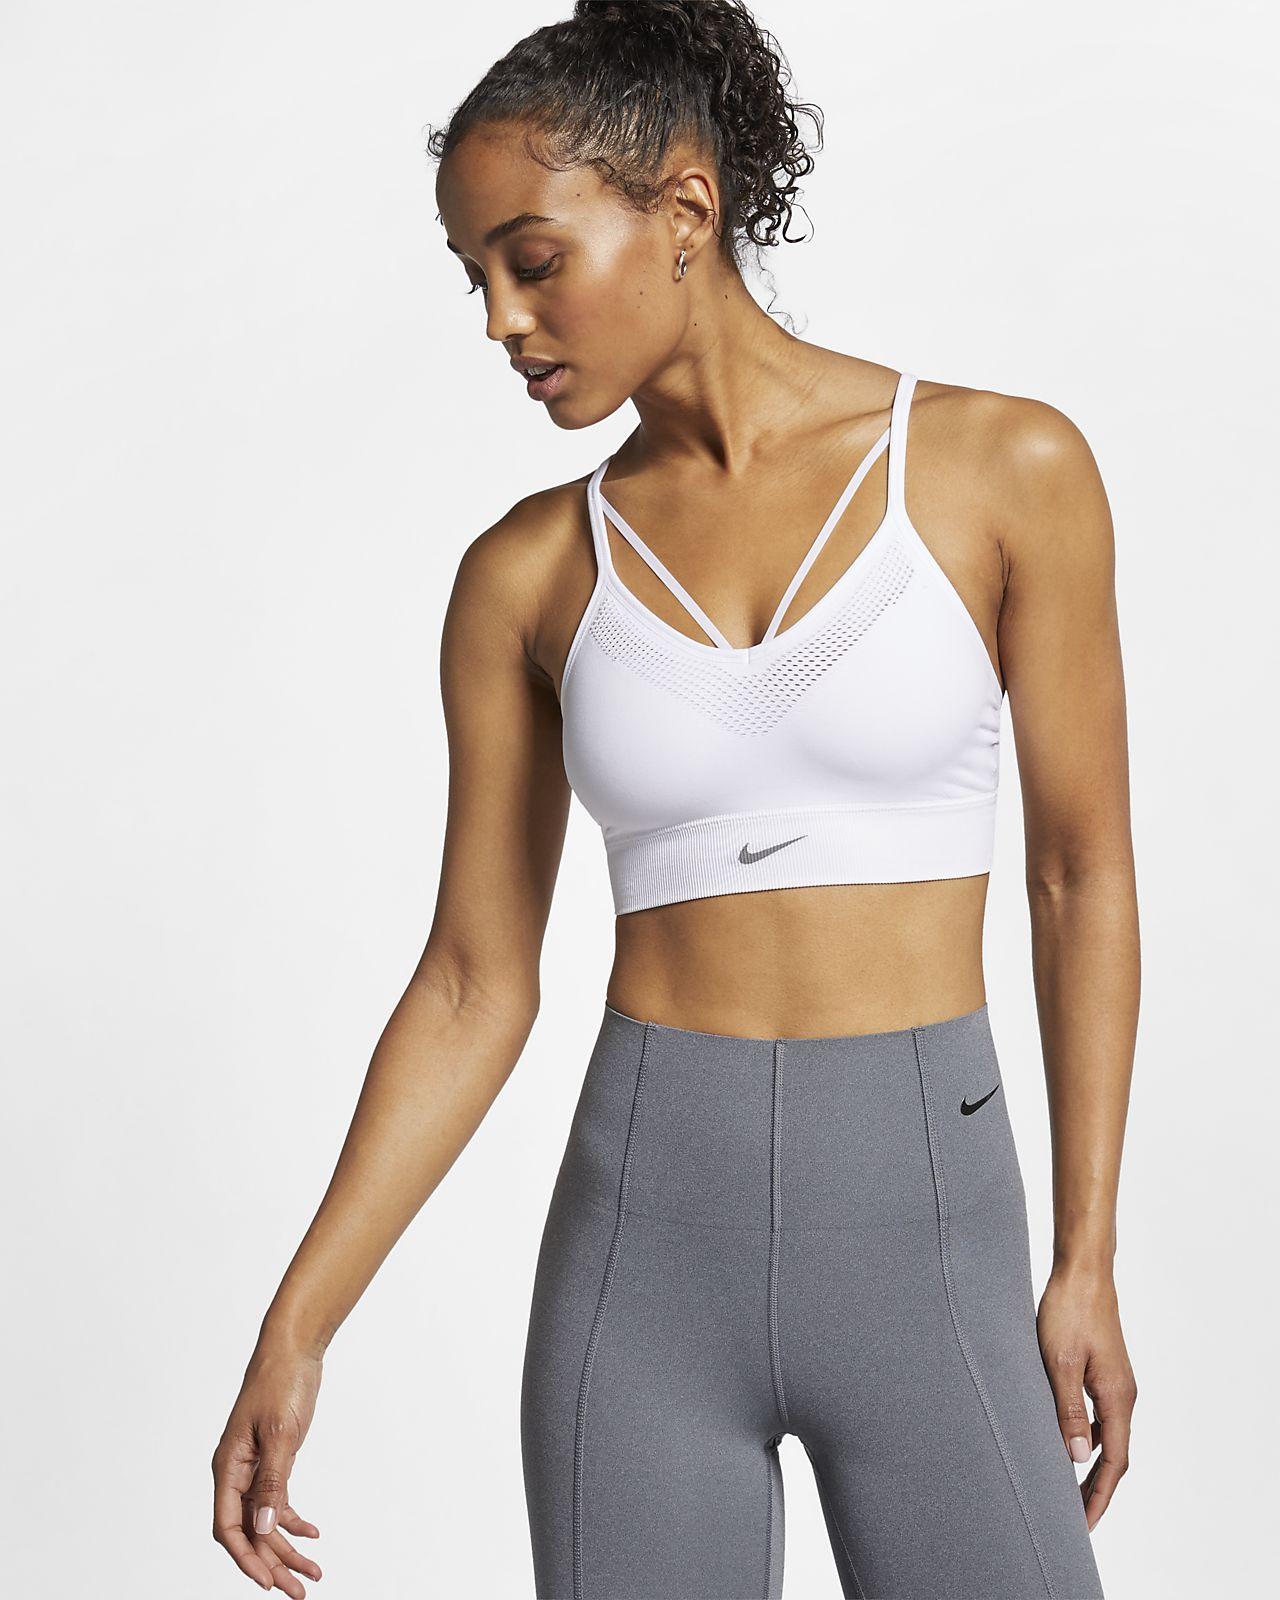 Nike  Women's Light Support Yoga Sports Bra